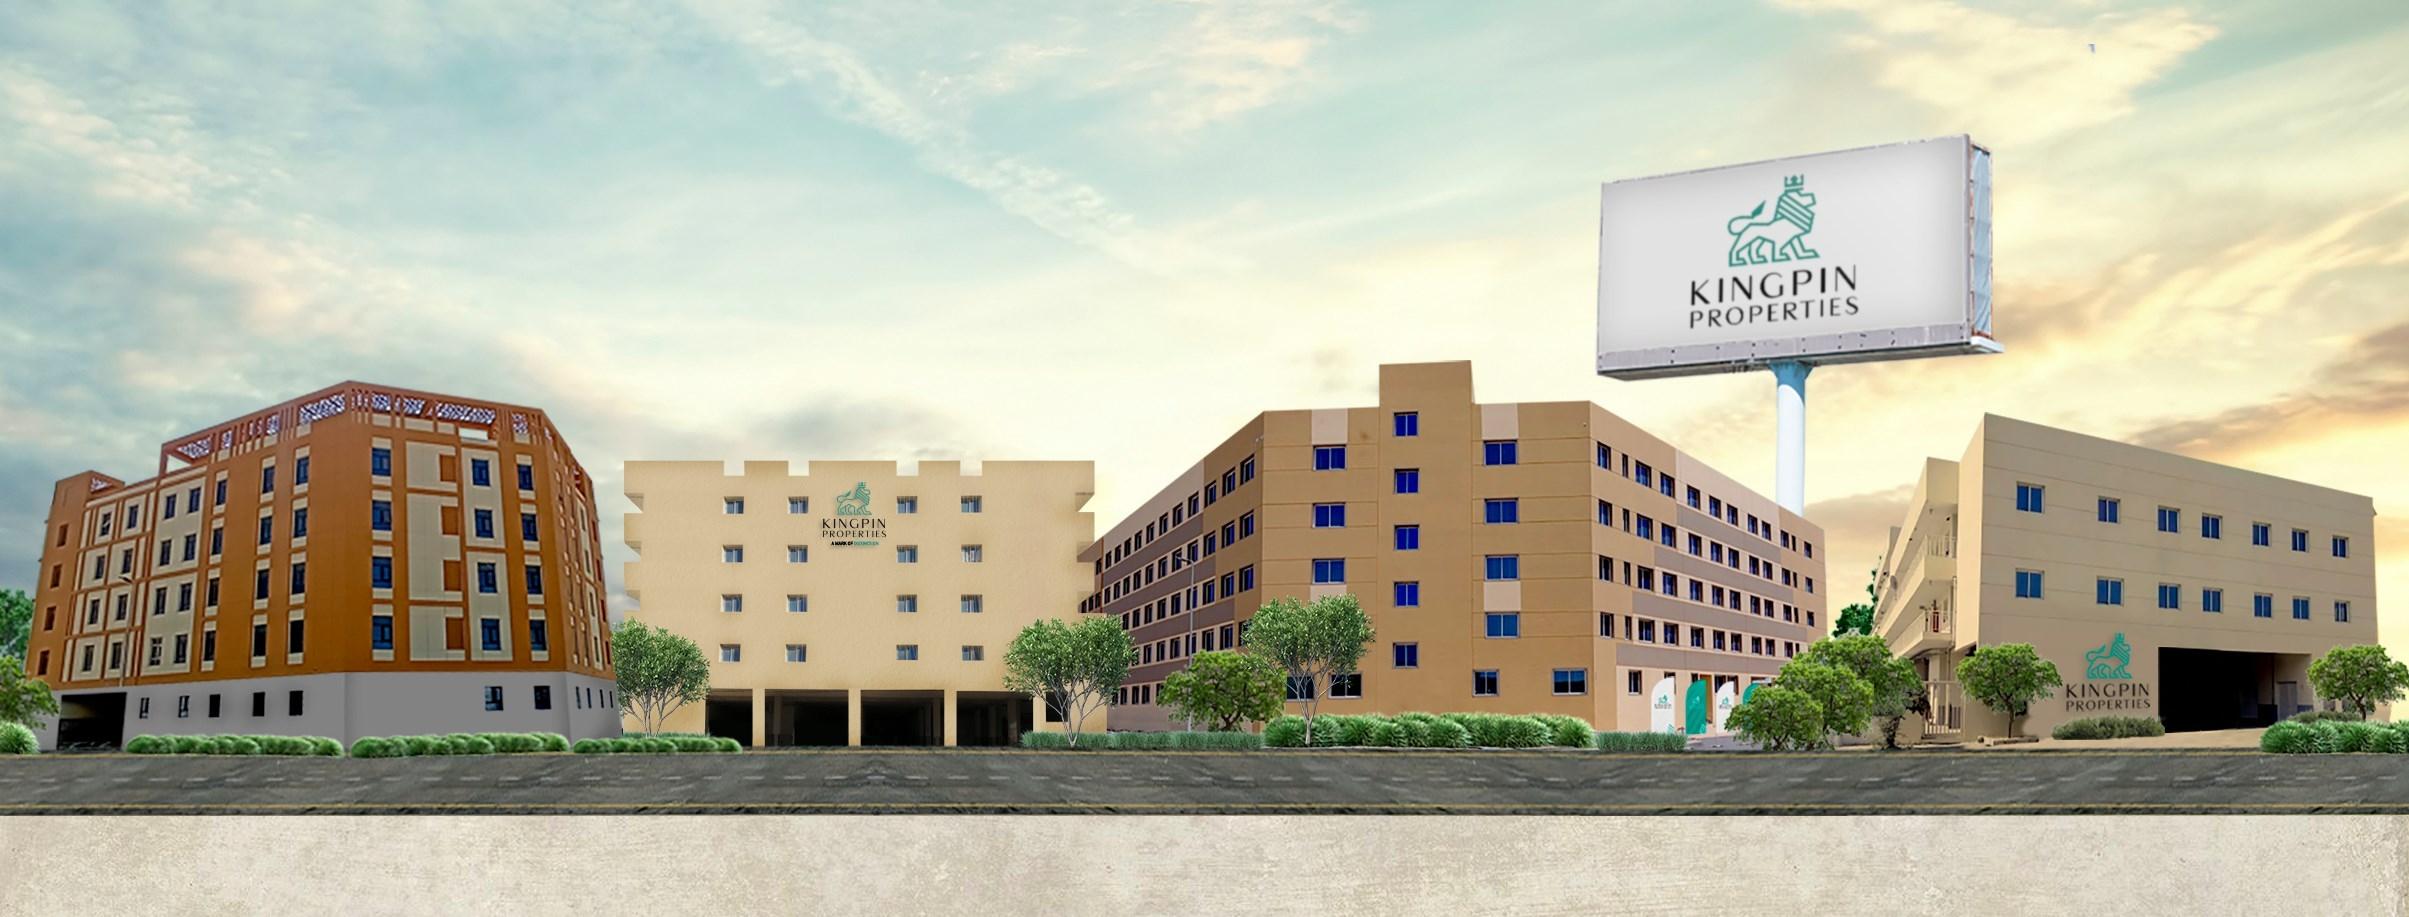 Kingpin Properties Dubai (@kingpincoae) Cover Image